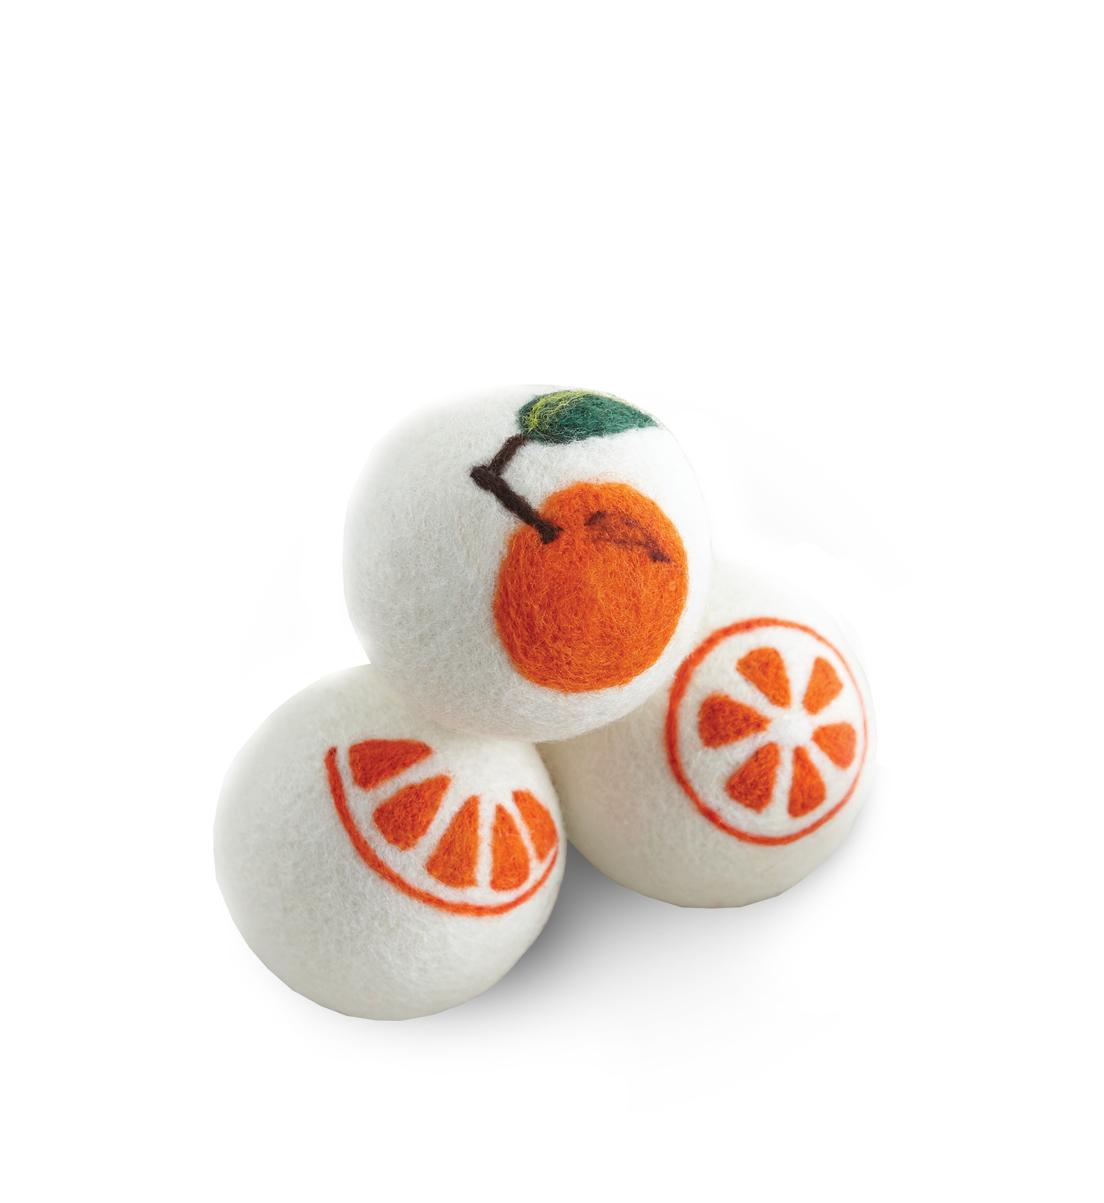 Fluff and Tumble Dryer Balls, citrus design